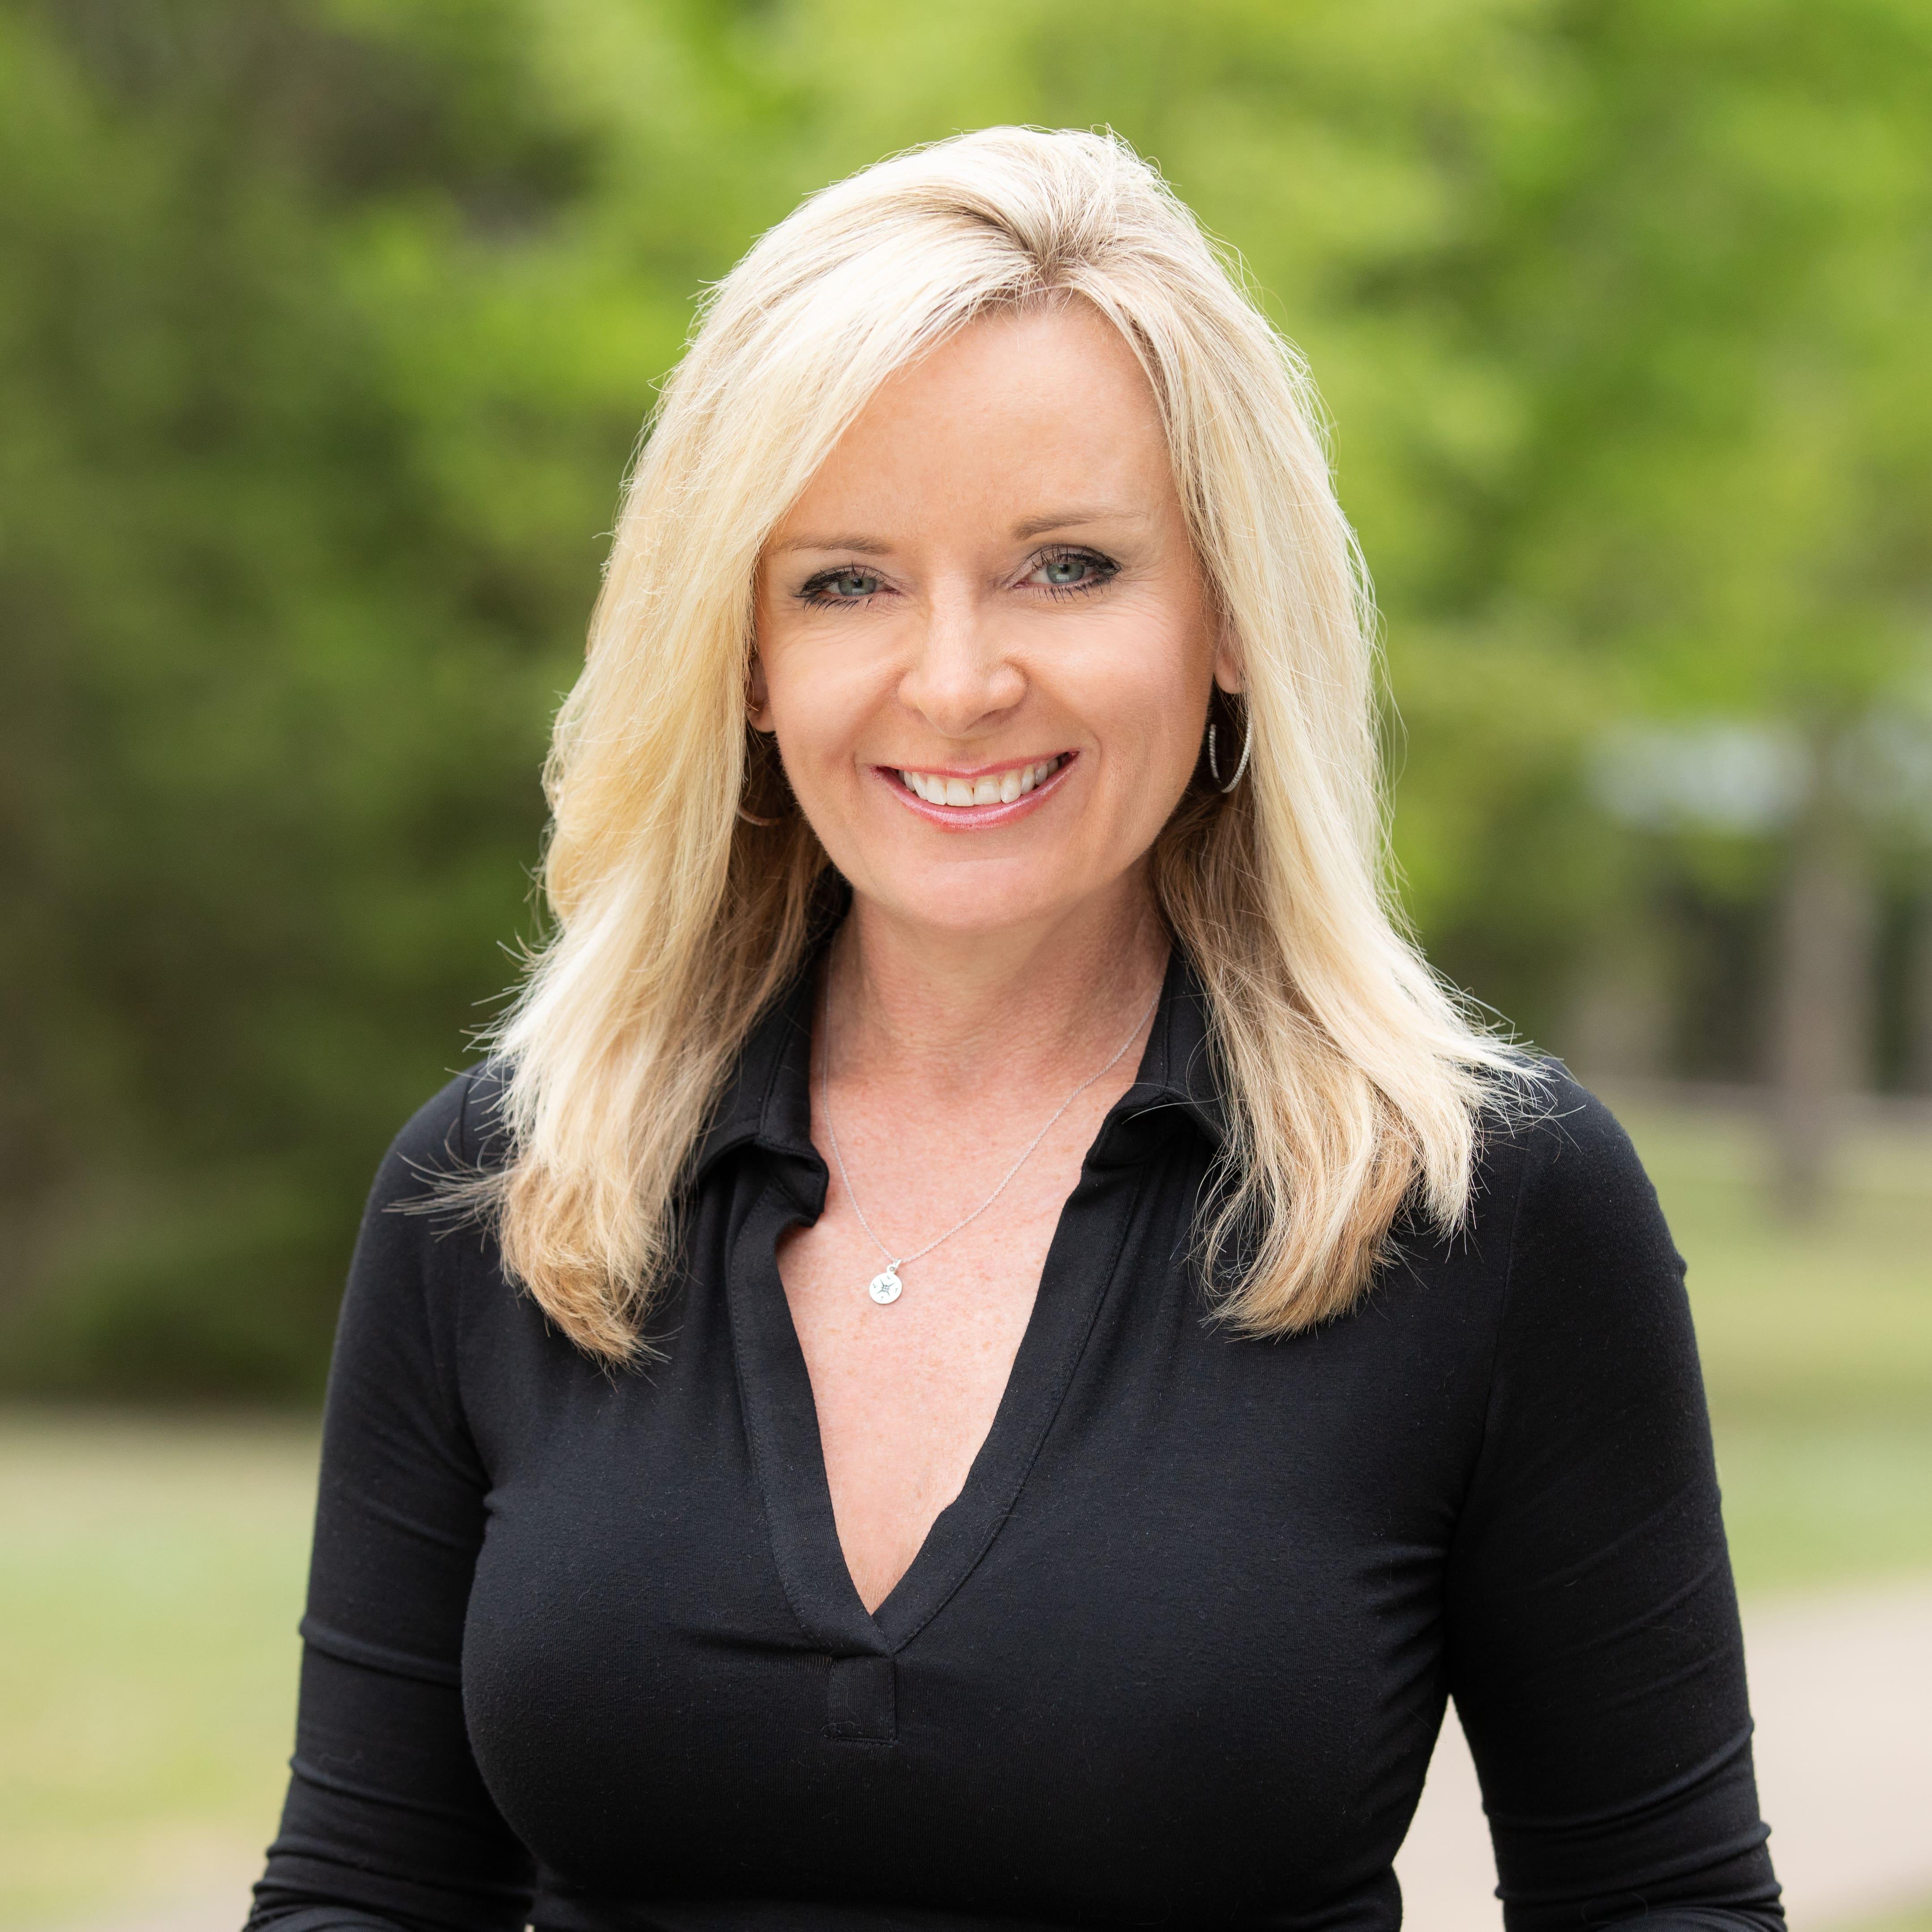 Kristi Richards